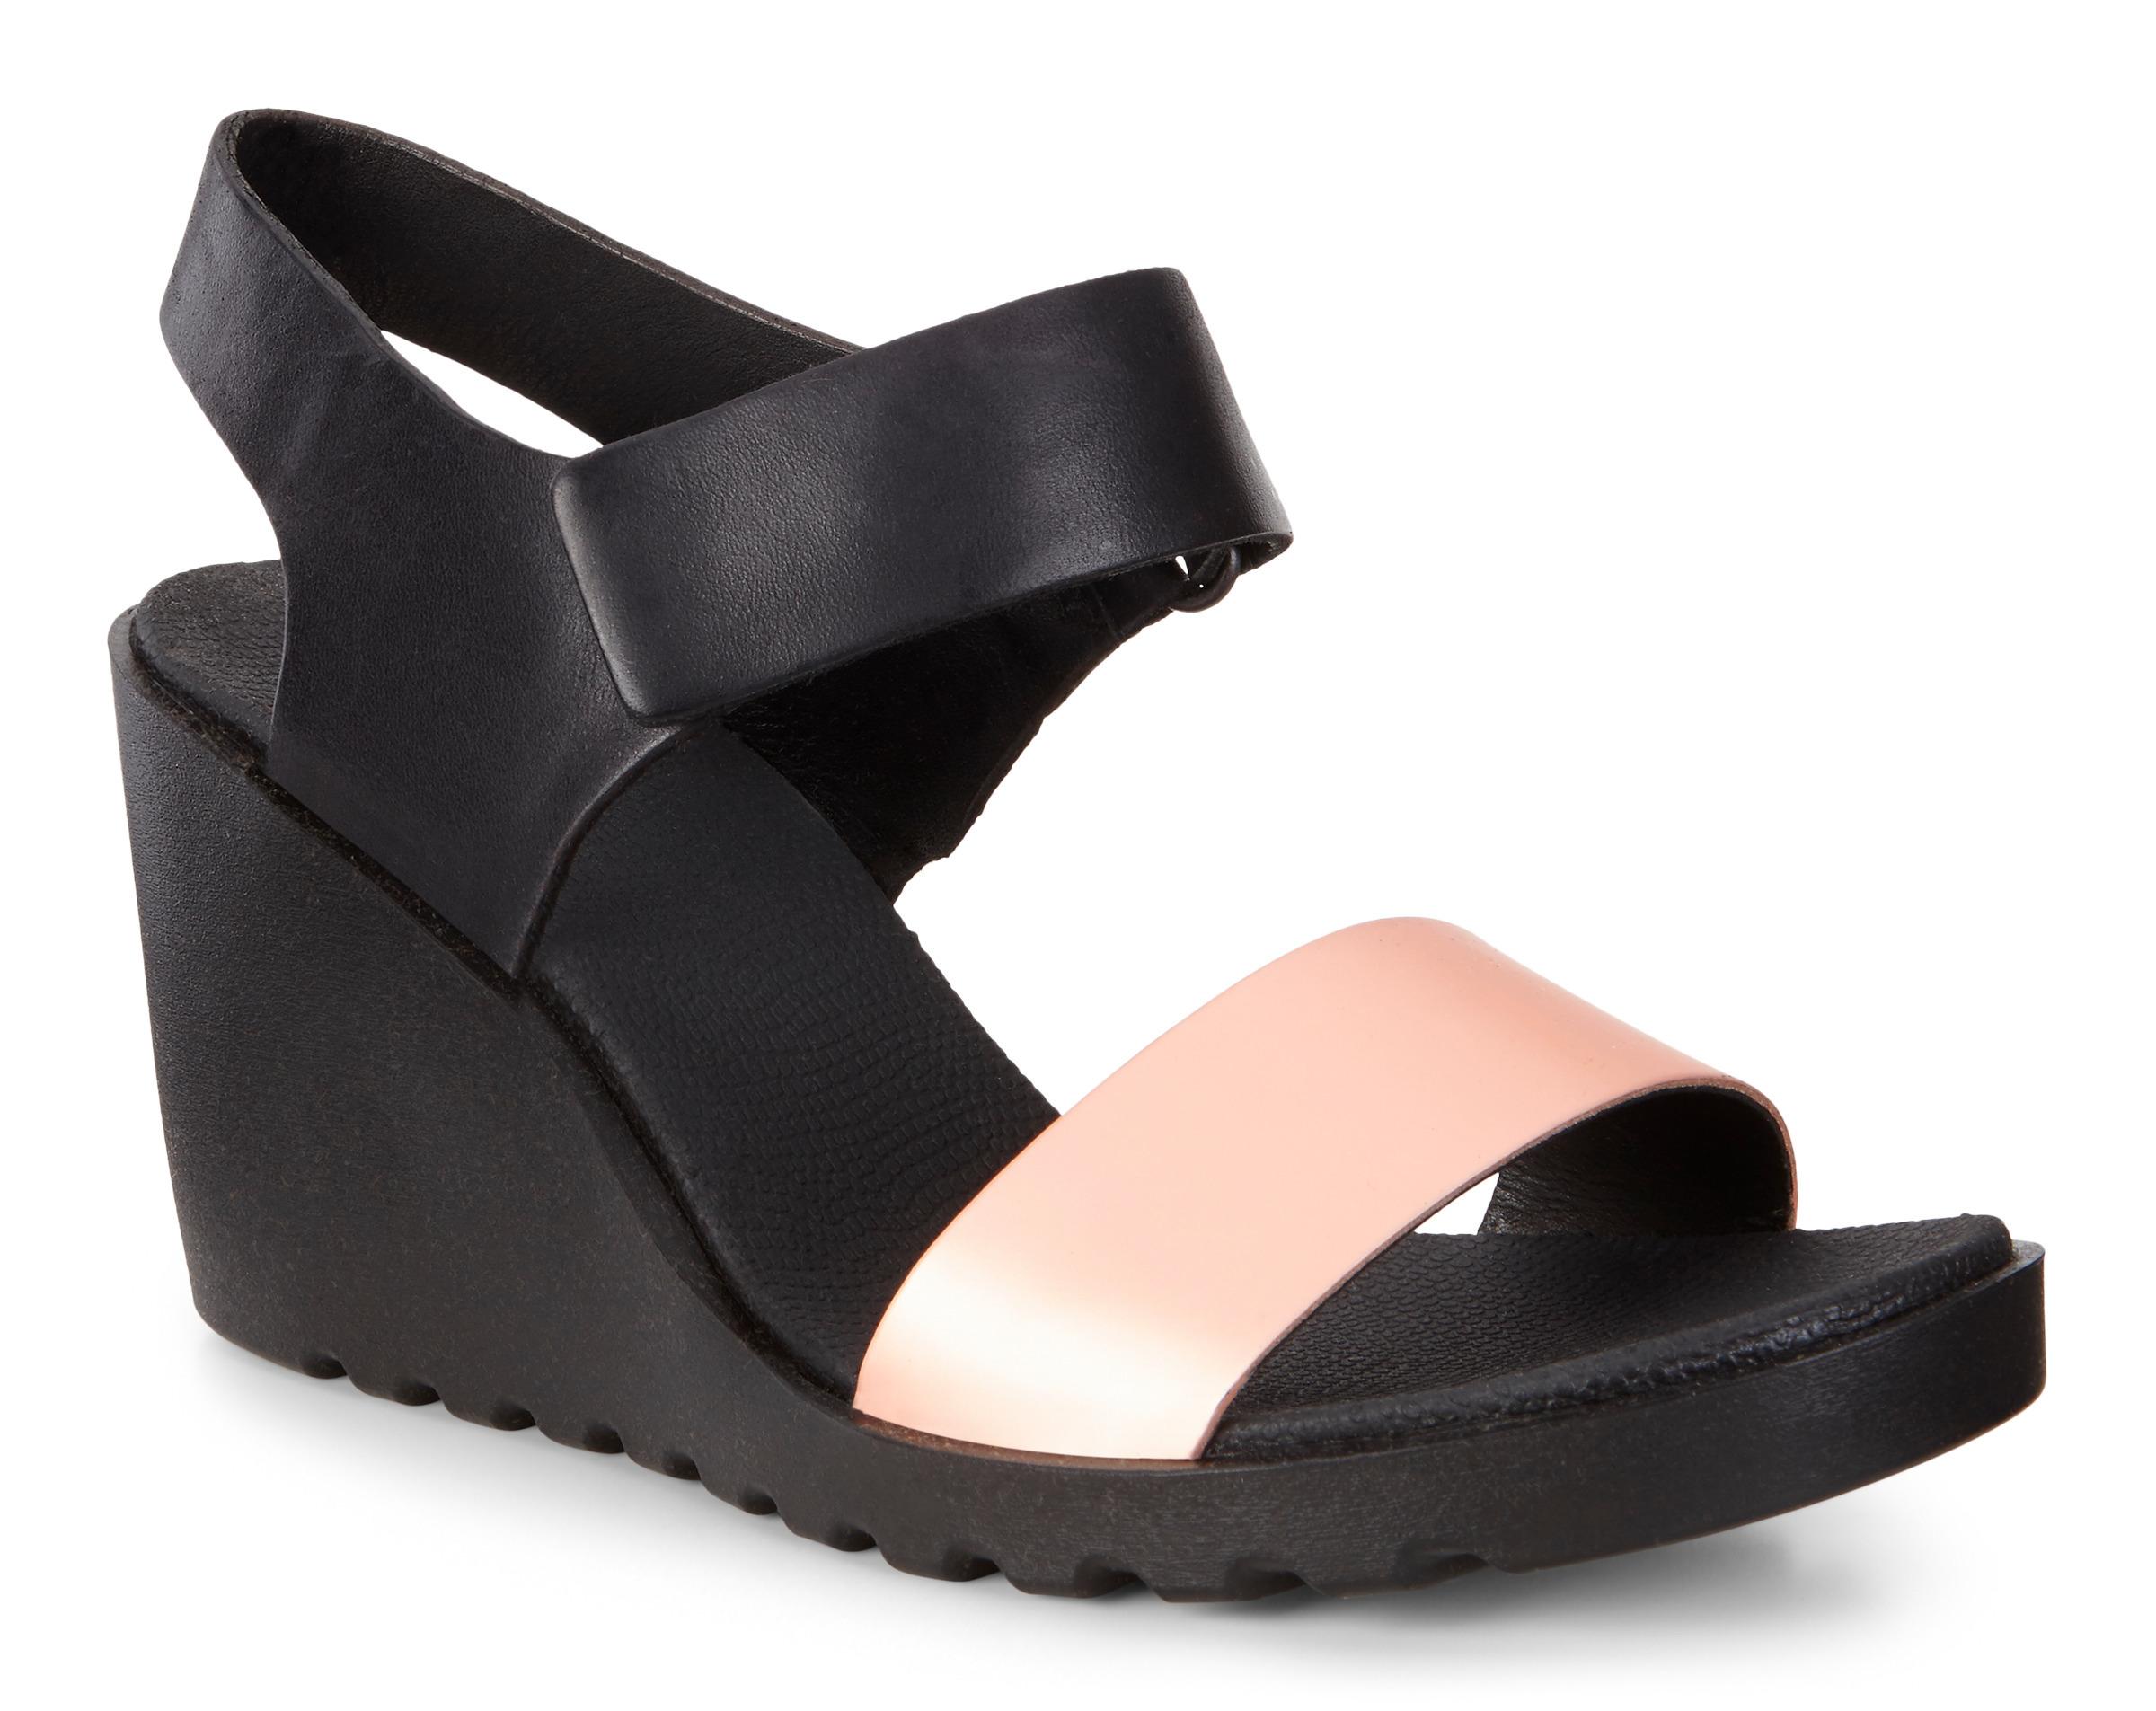 03deab0d7581 ECCO FREJA WEDGE SANDAL Women Shoes Heels